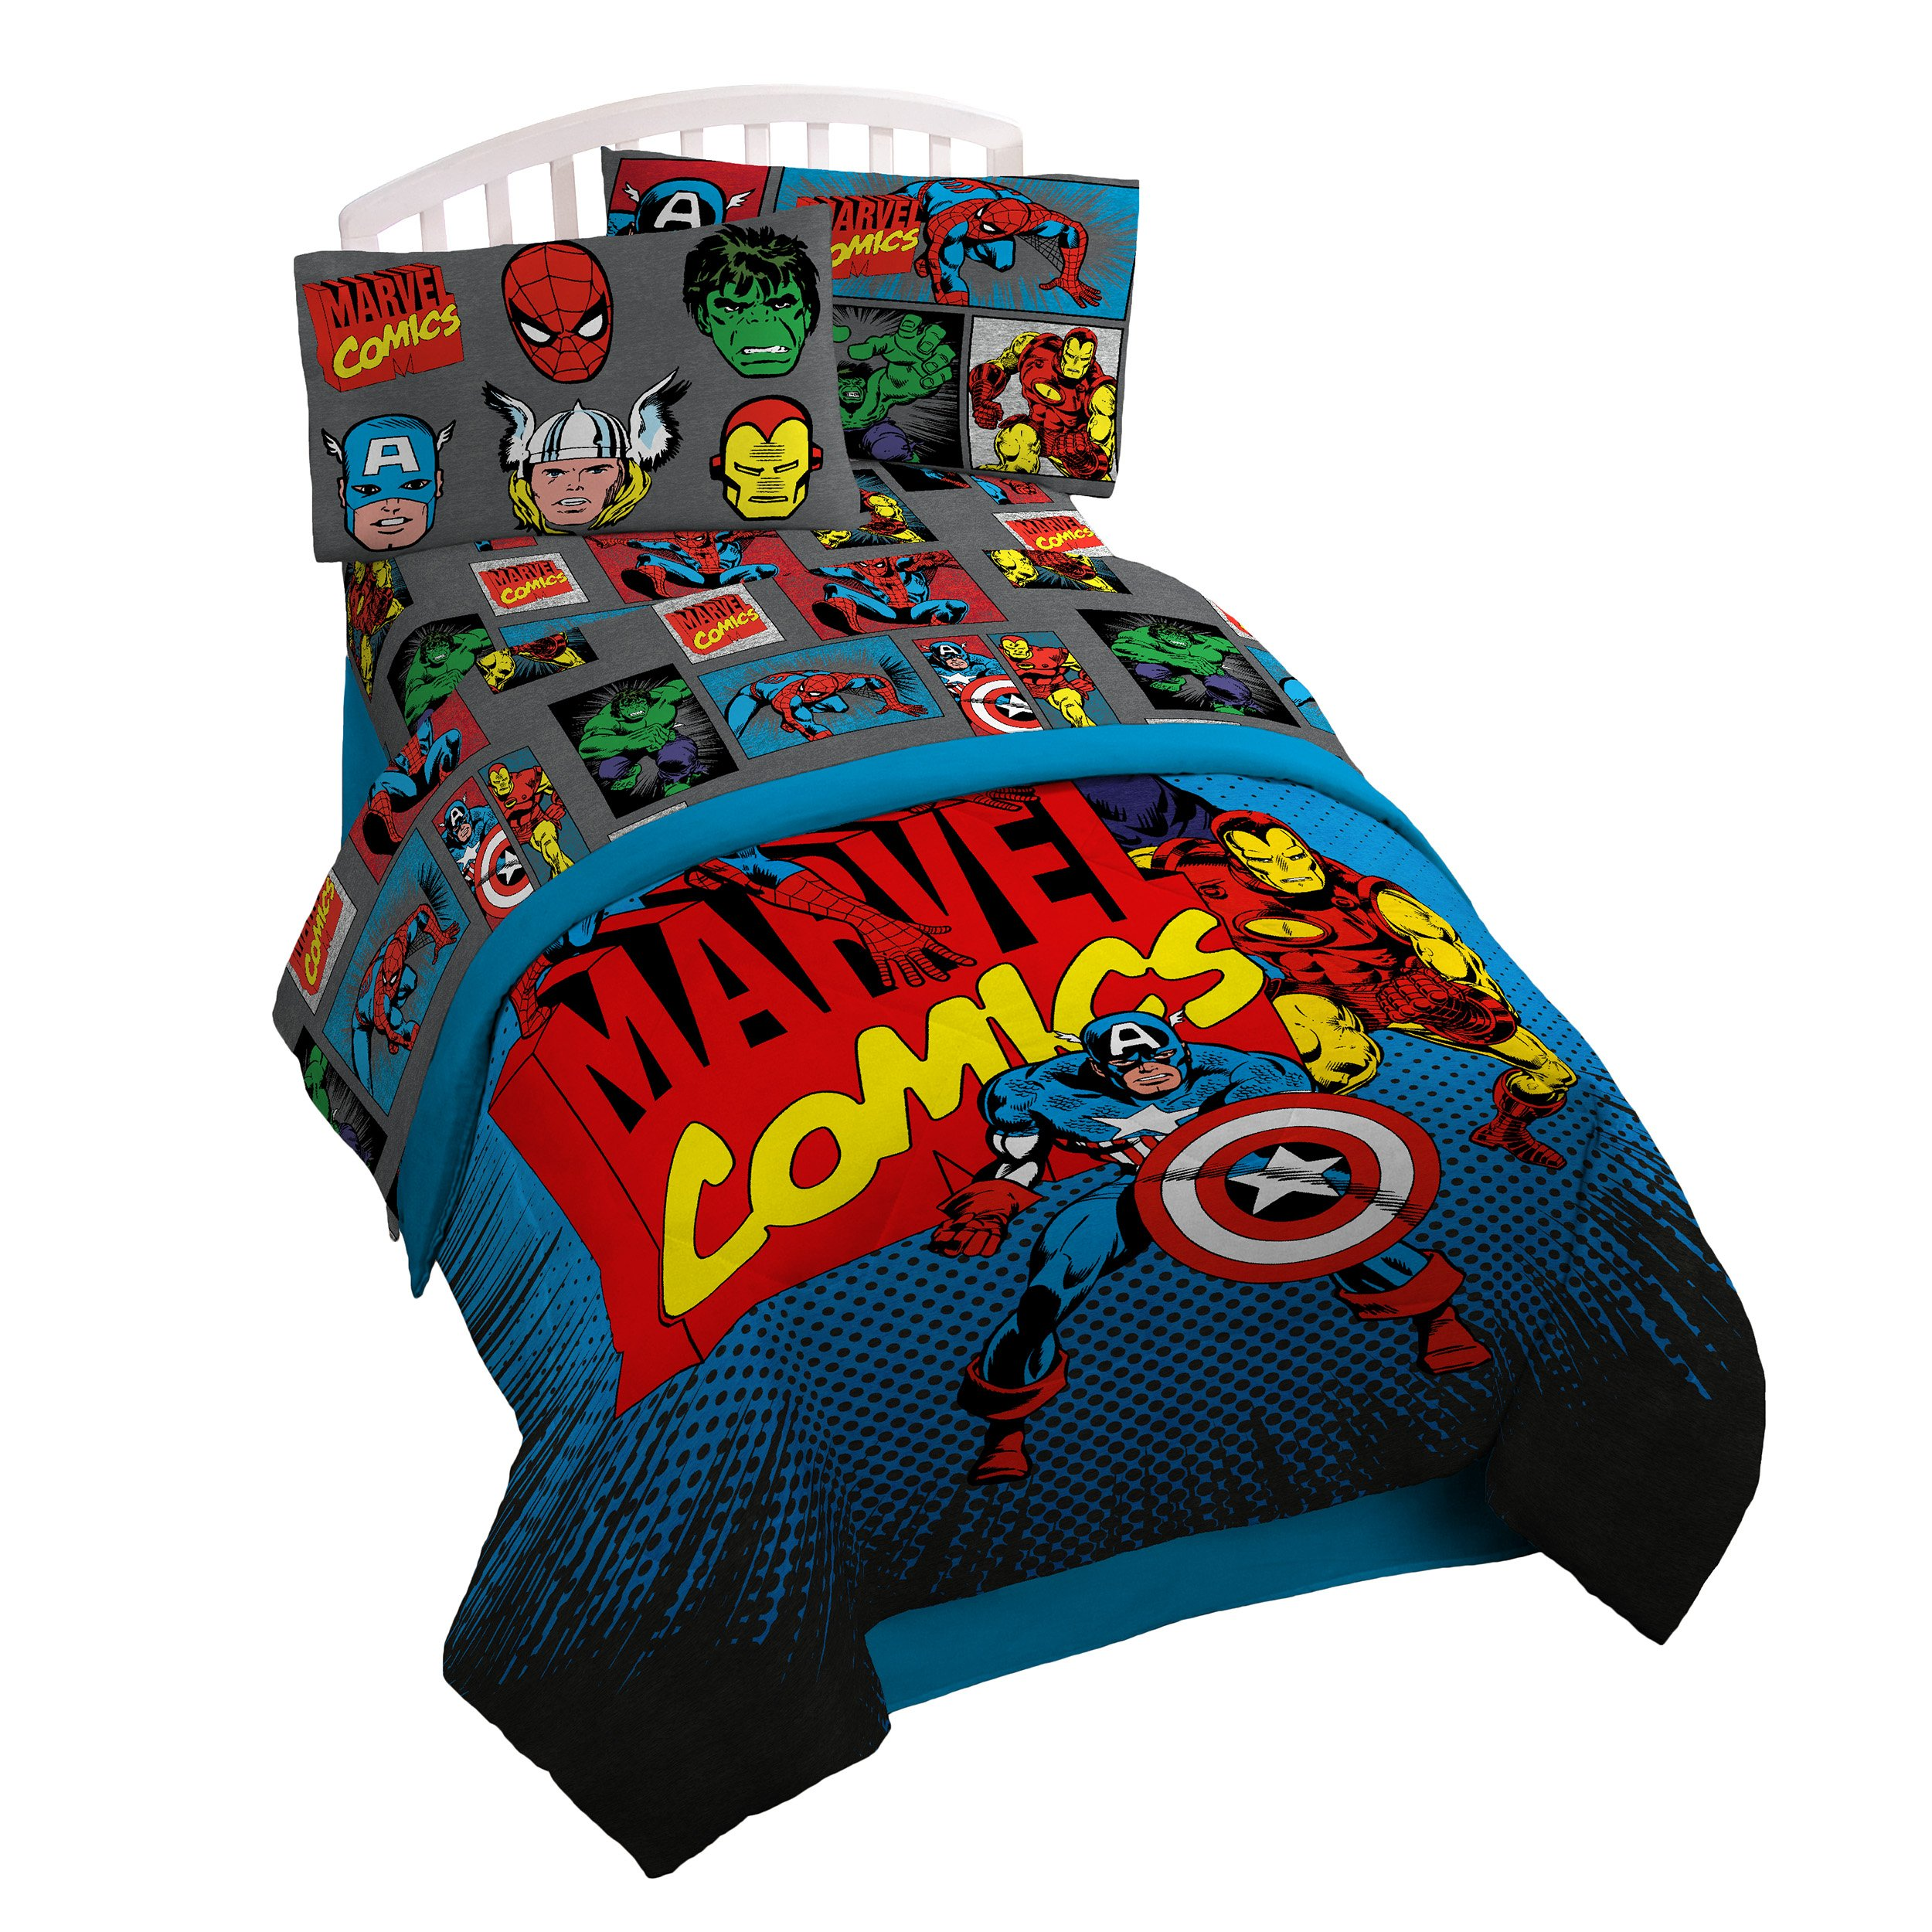 Superhero Bedroom Decor: Amazon.com